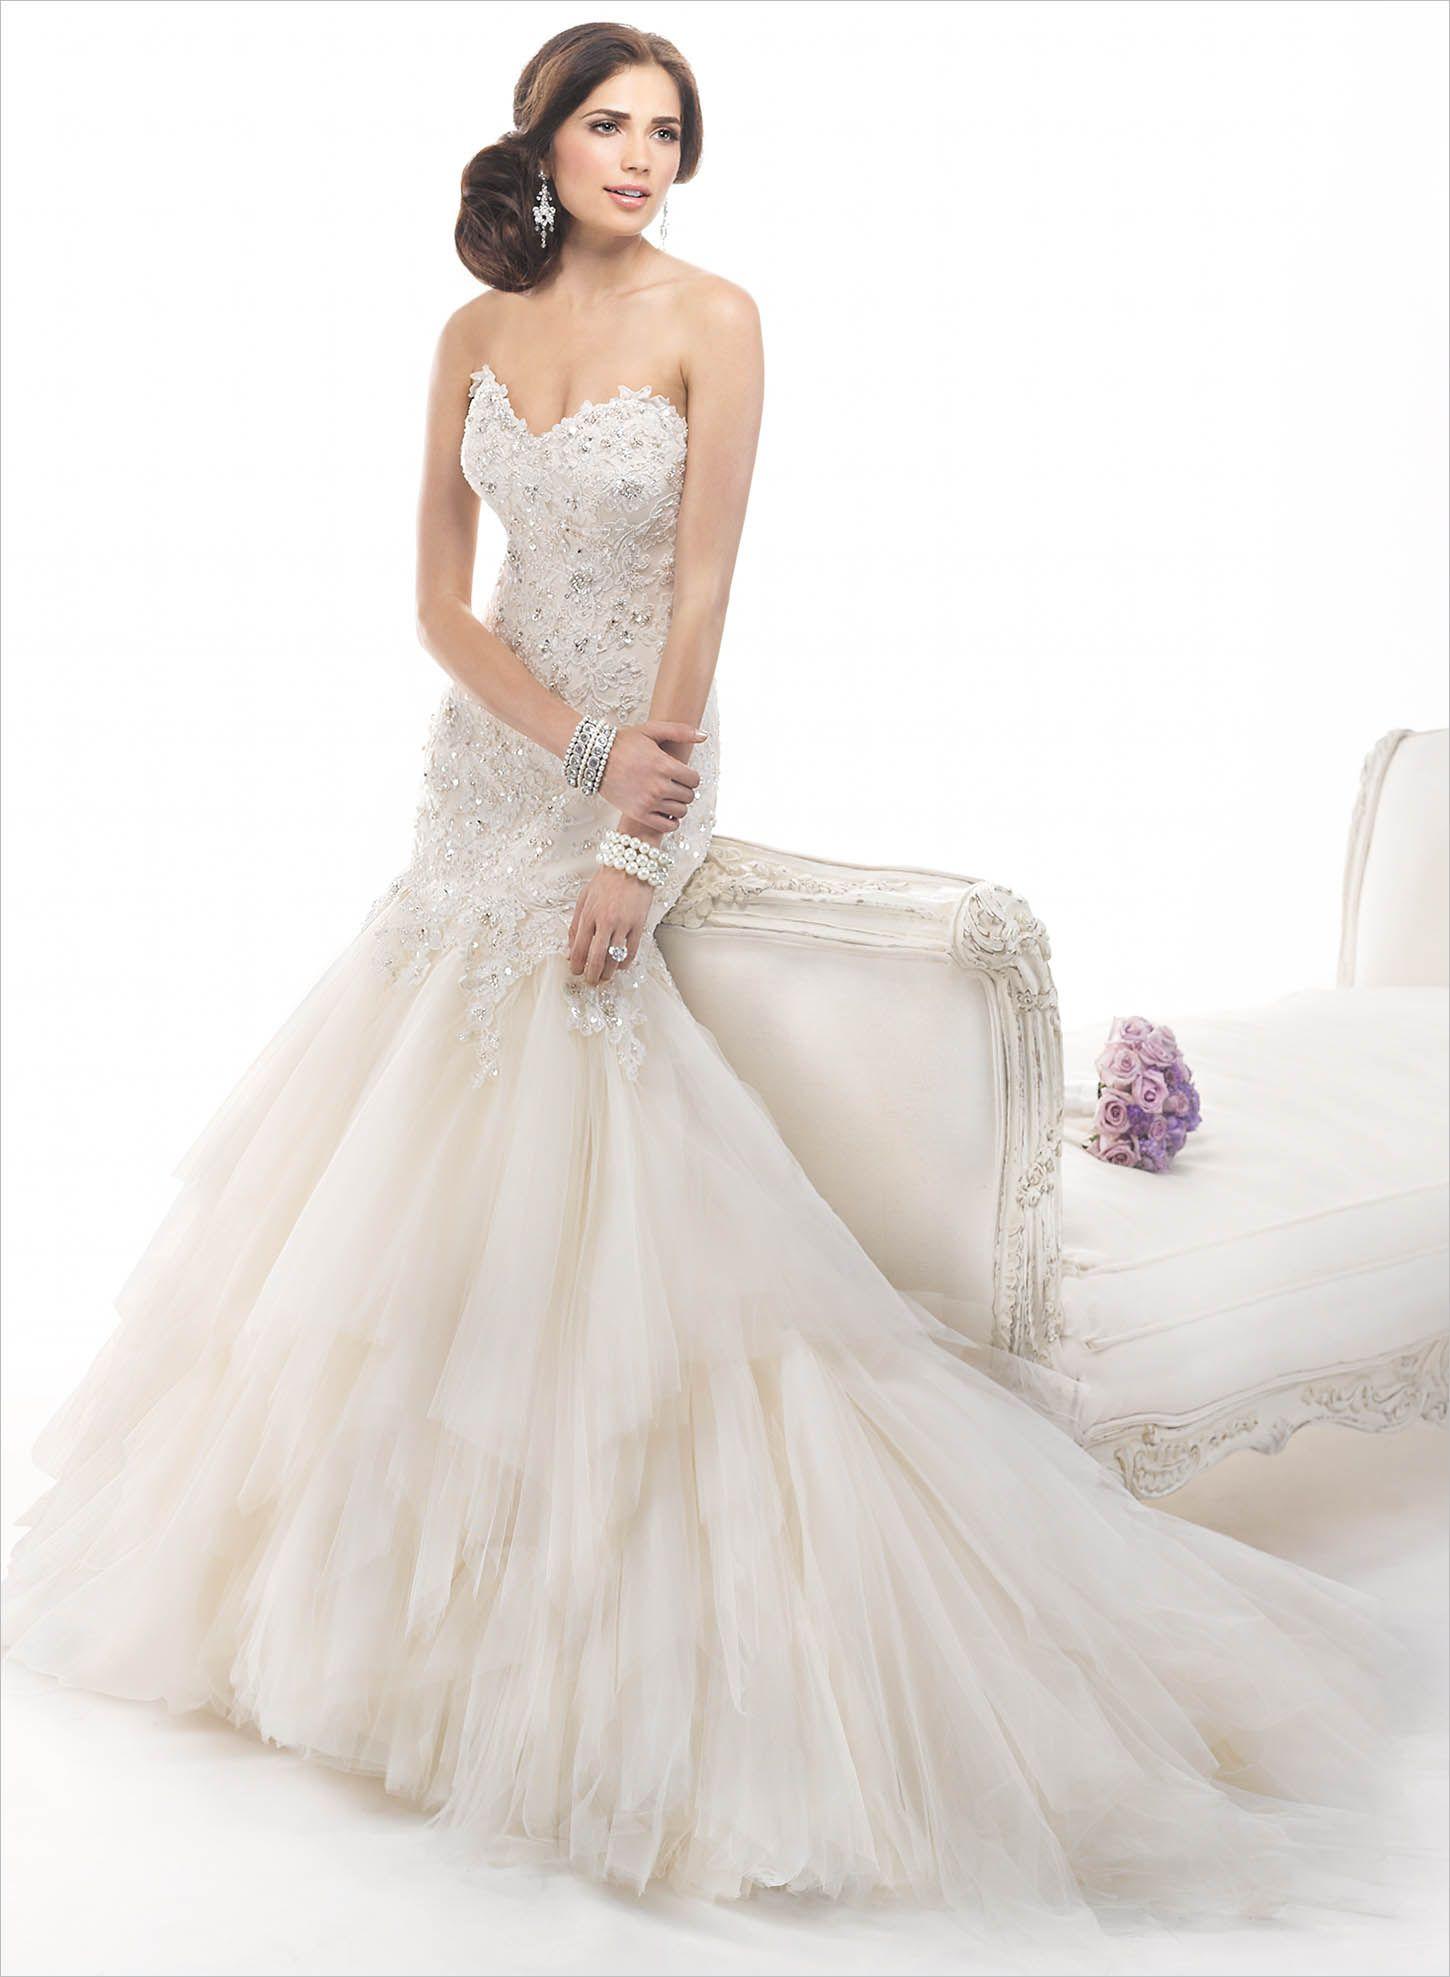 Contemporary Maggie Sottero Wedding Gown Festooning - Wedding Dress ...